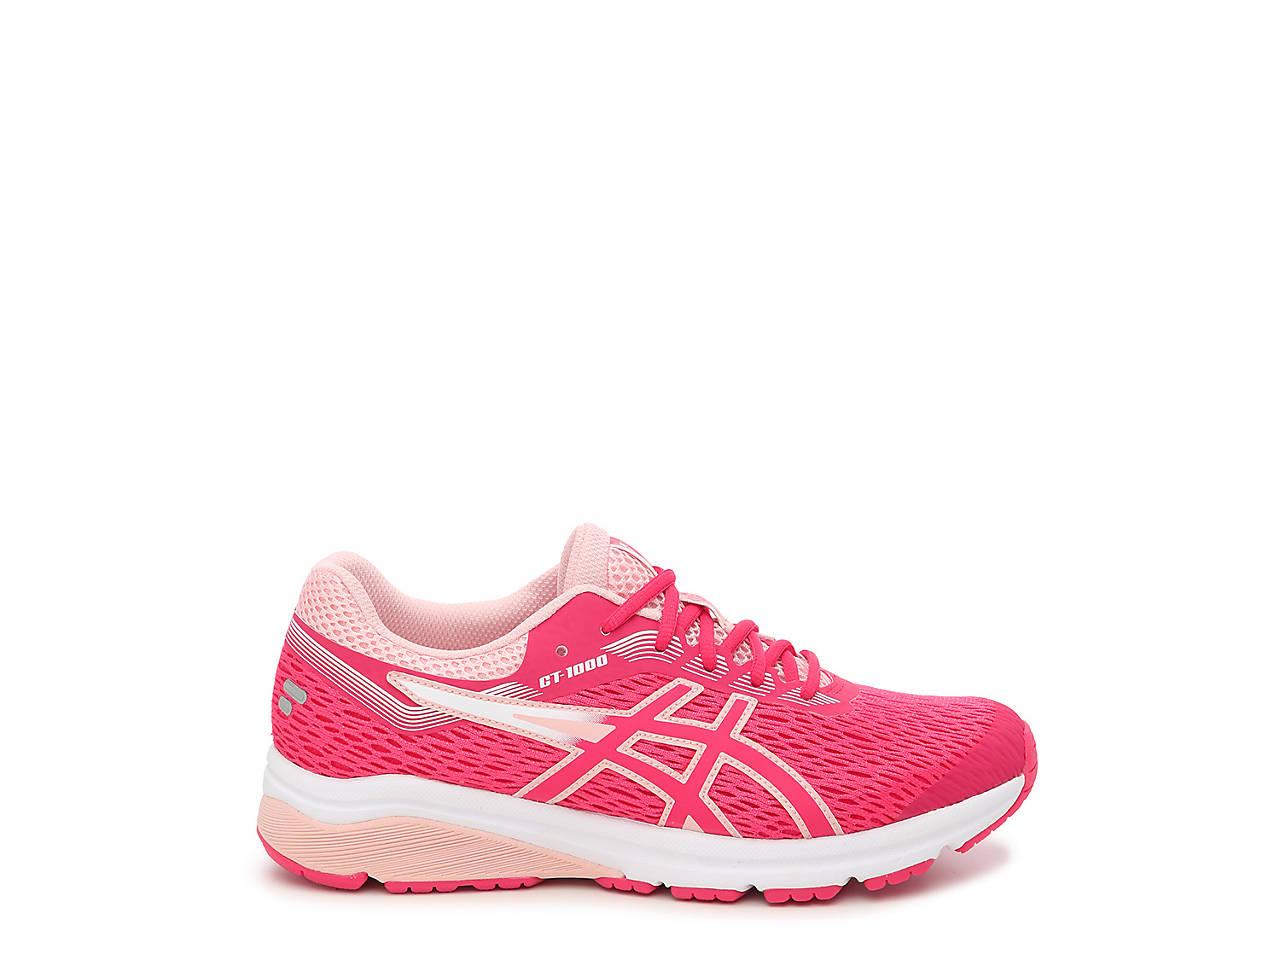 brand new 540ec b41c3 ASICS. GT-1000 7 GS Youth Running Shoe